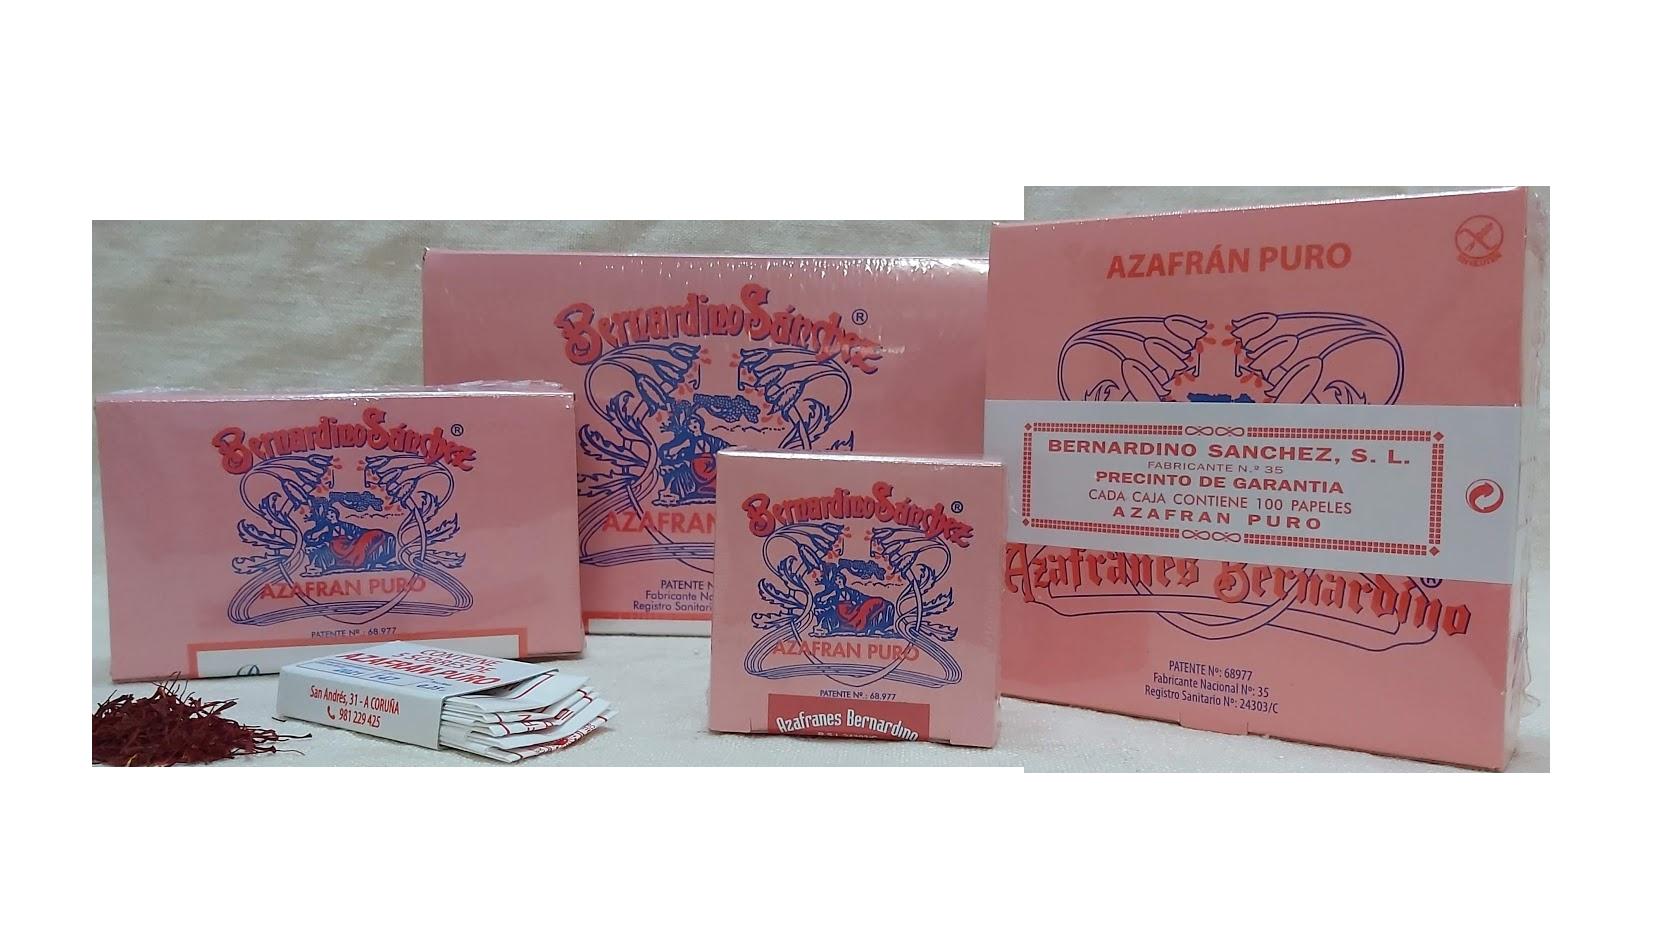 Azafranes Bernardino · Cajas de azafrán puro molido